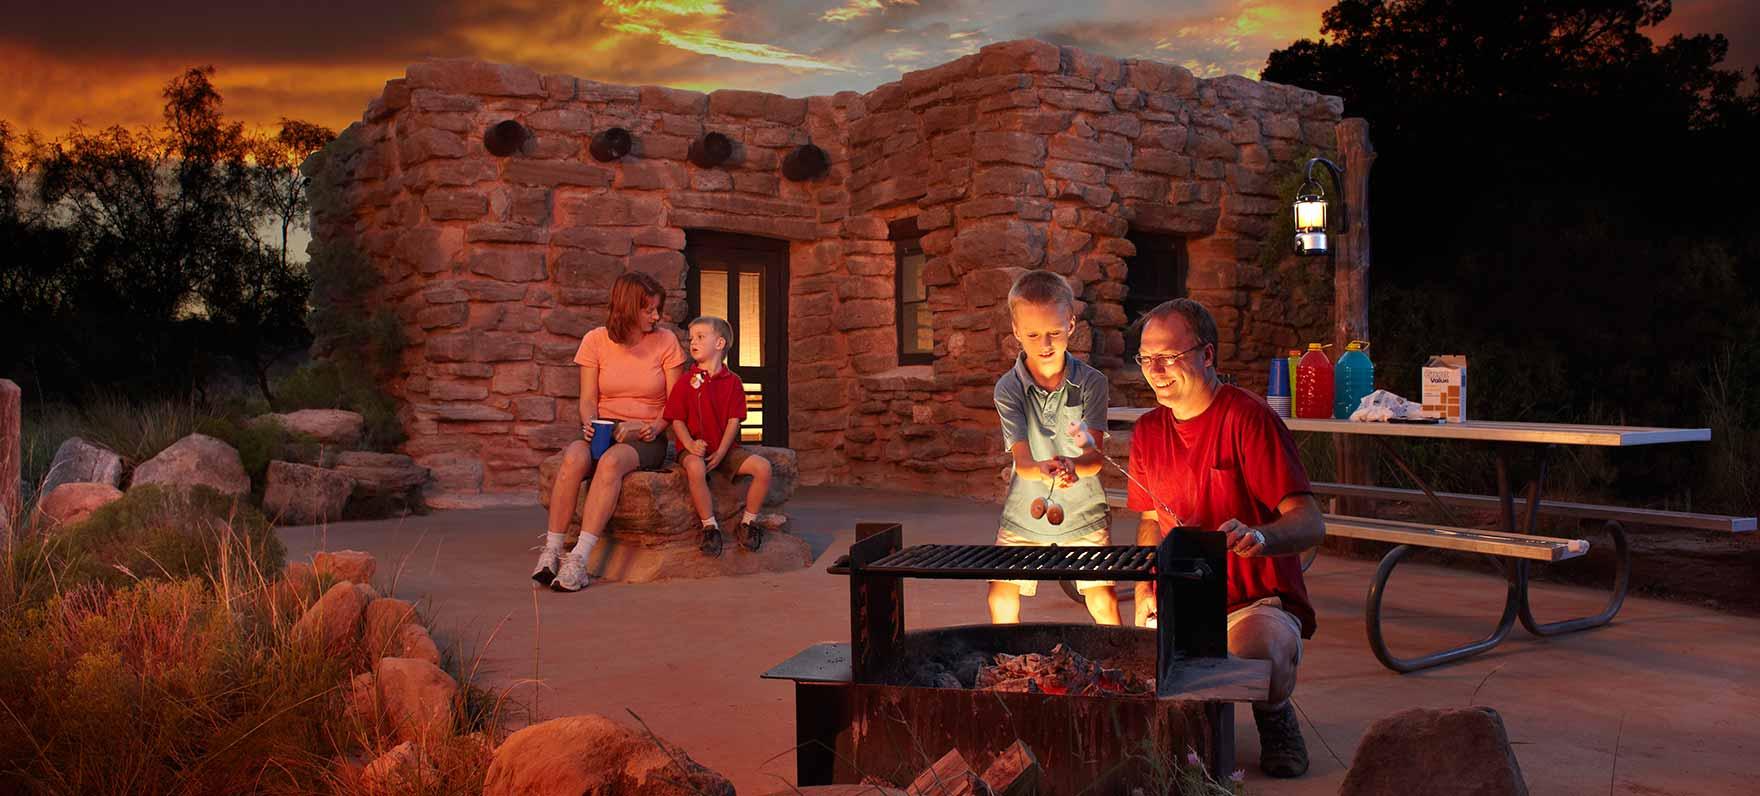 Enjoying the amenities at Palo Duro Canyon State Park.